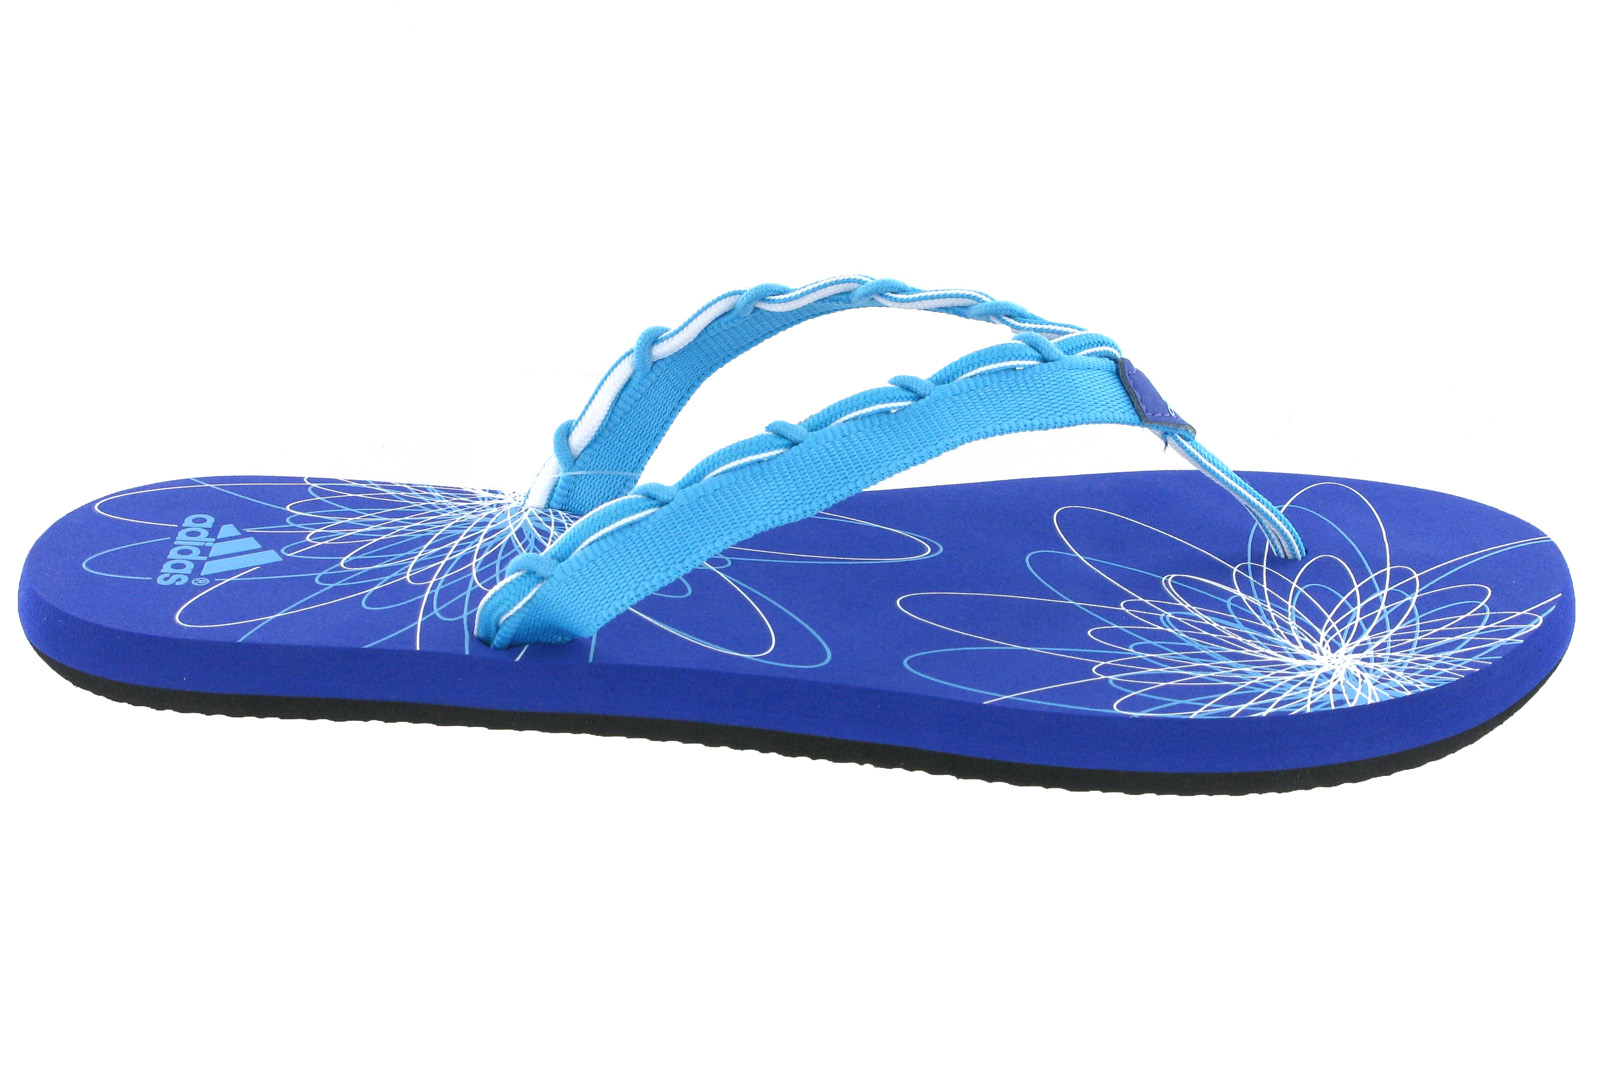 new womens adidas laosand purple comfort flip flop beach. Black Bedroom Furniture Sets. Home Design Ideas